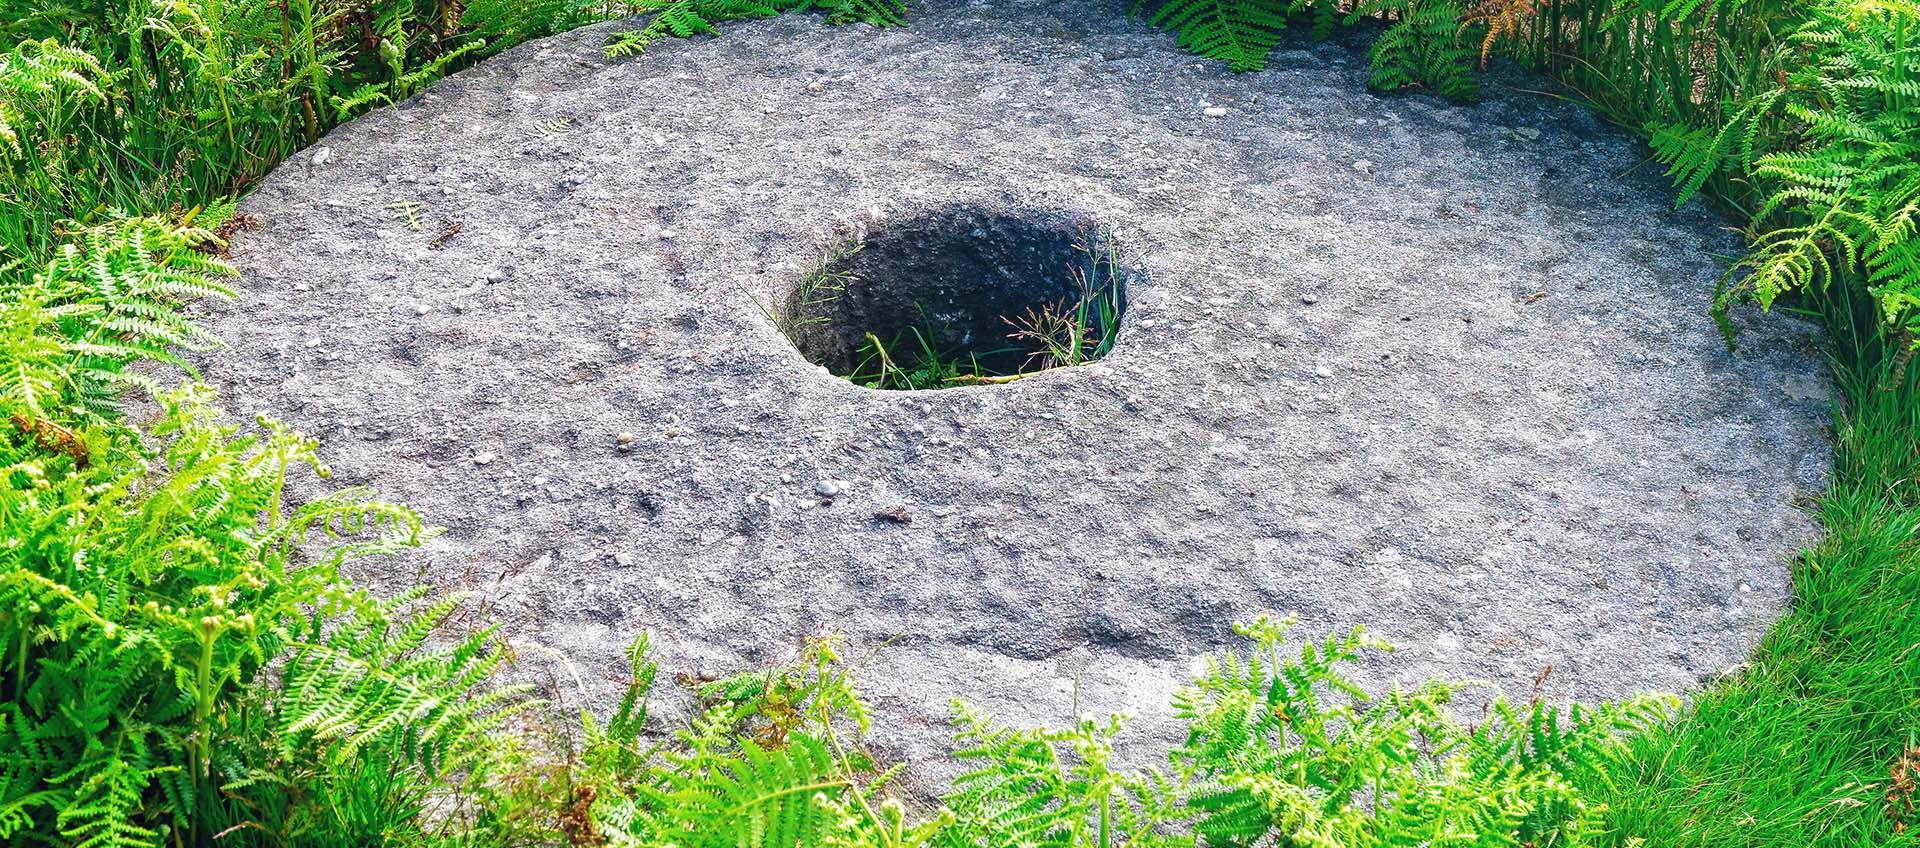 UX - Utopia or millstone?